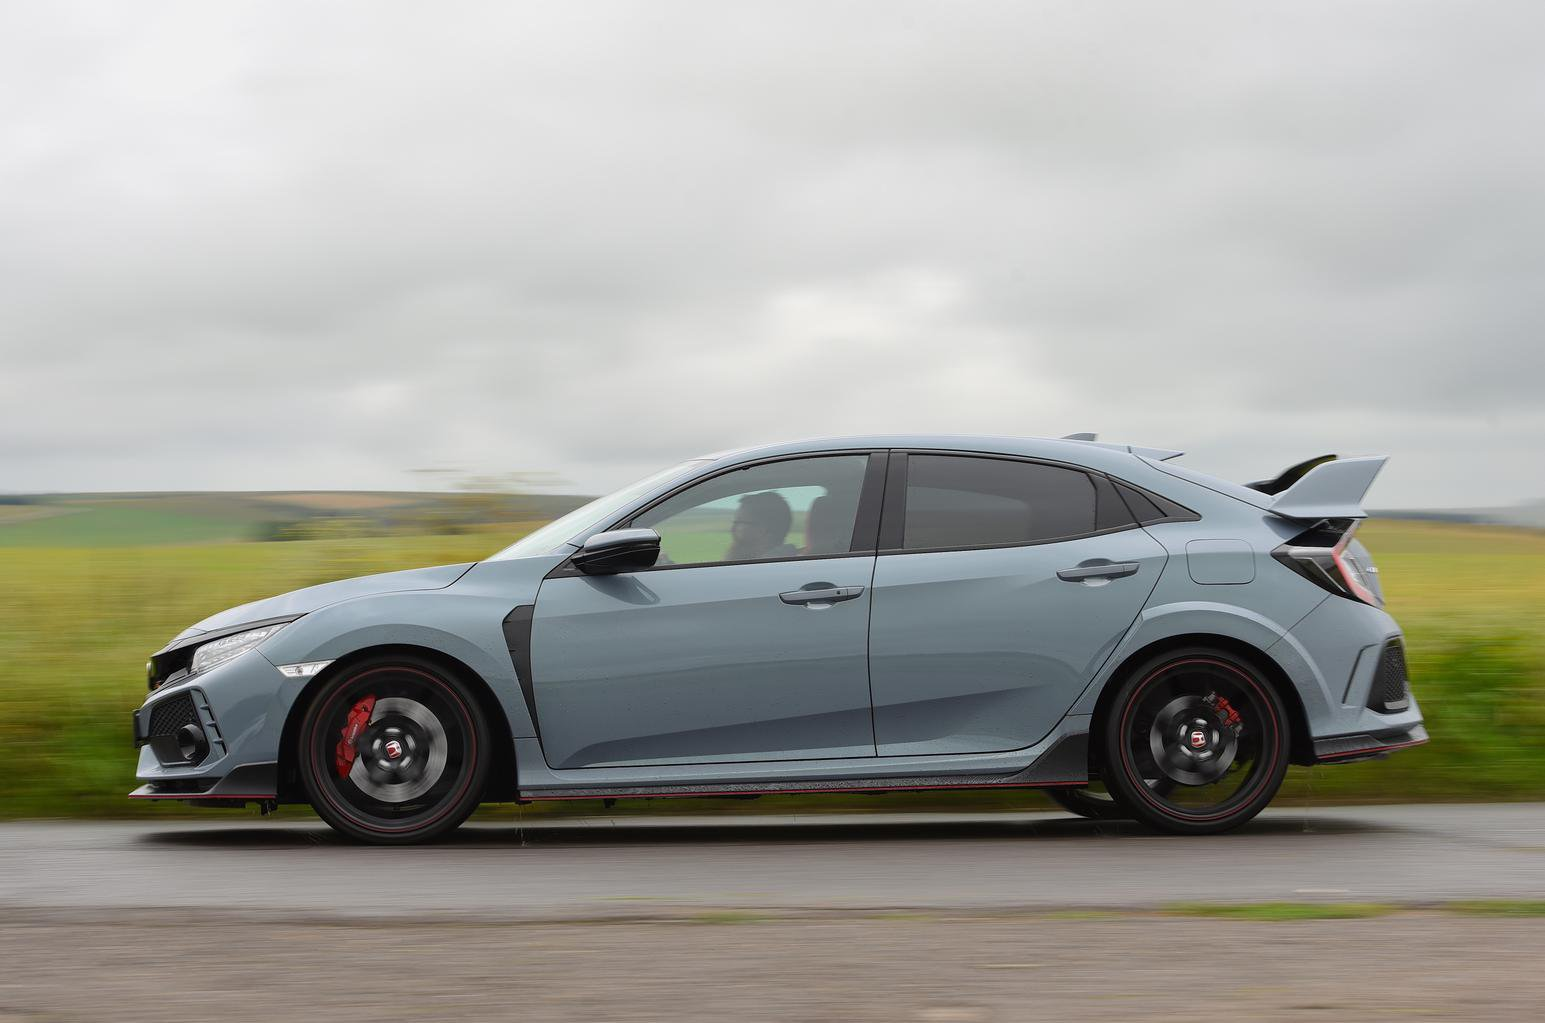 New Honda Civic Type R Vs Bmw M140i Vs Ford Focus Rs What Car